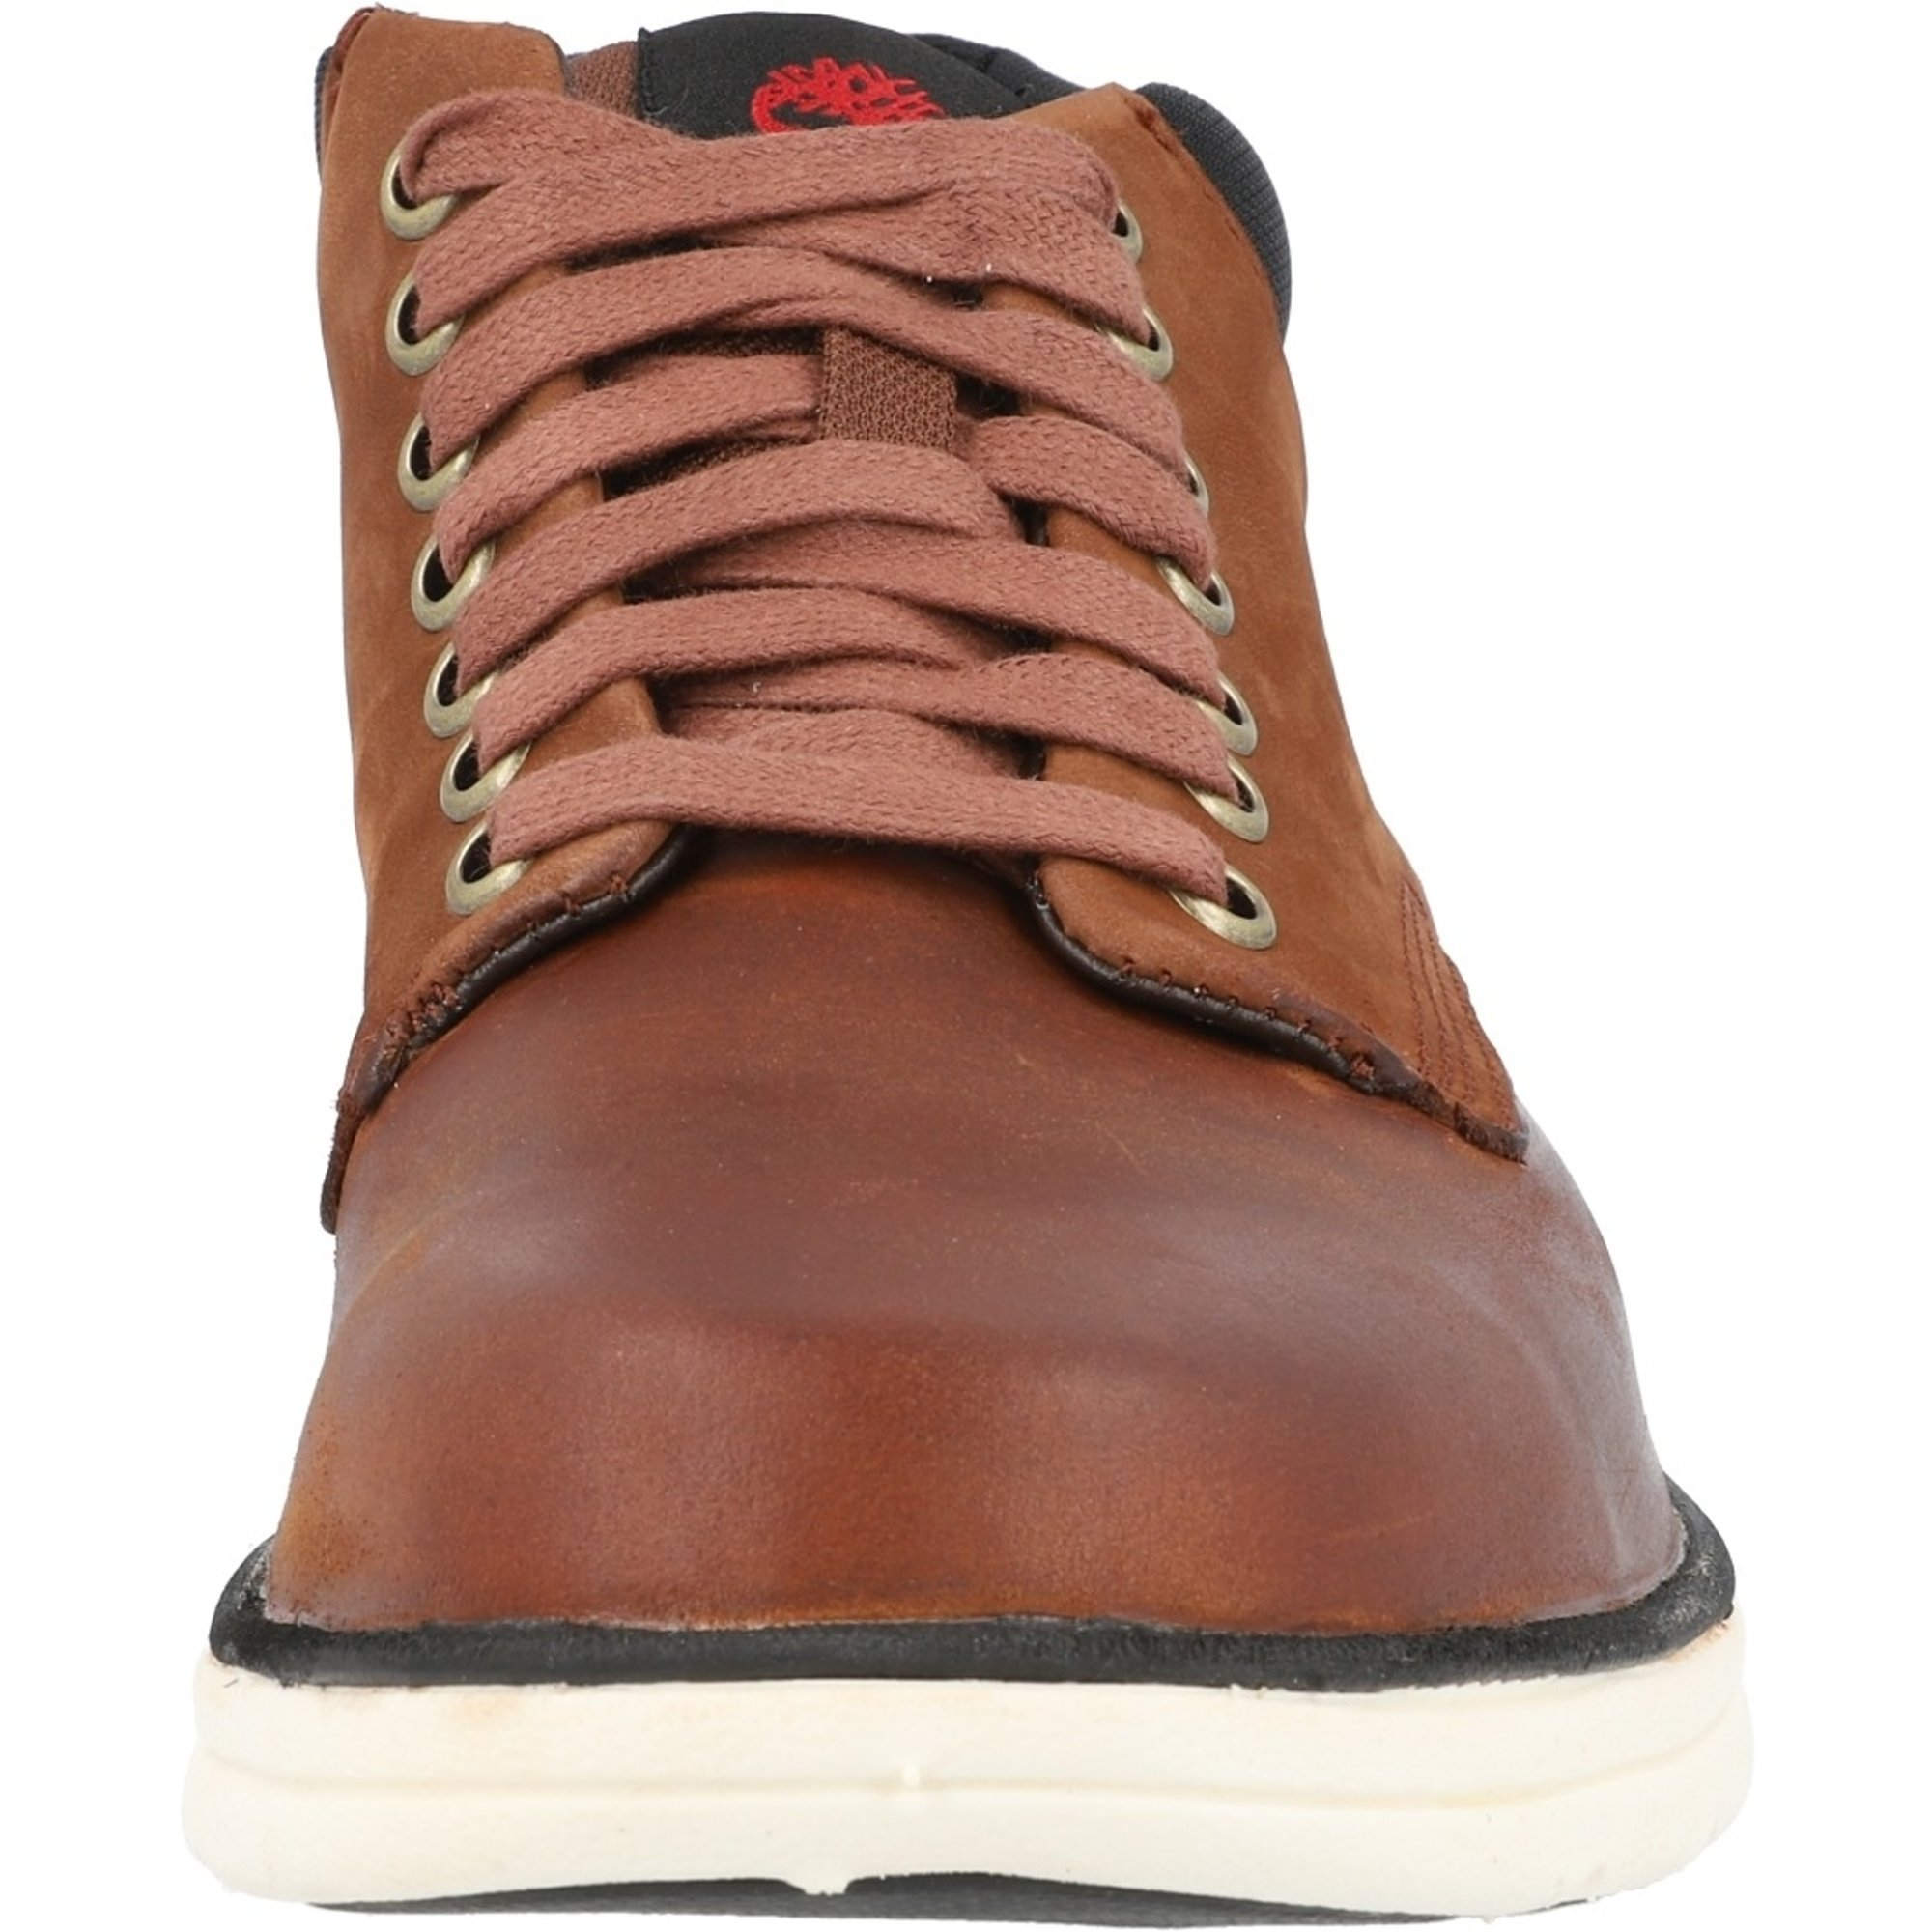 Timberland Bradstreet Leather Chukka Medium Brown Full Grain Leather